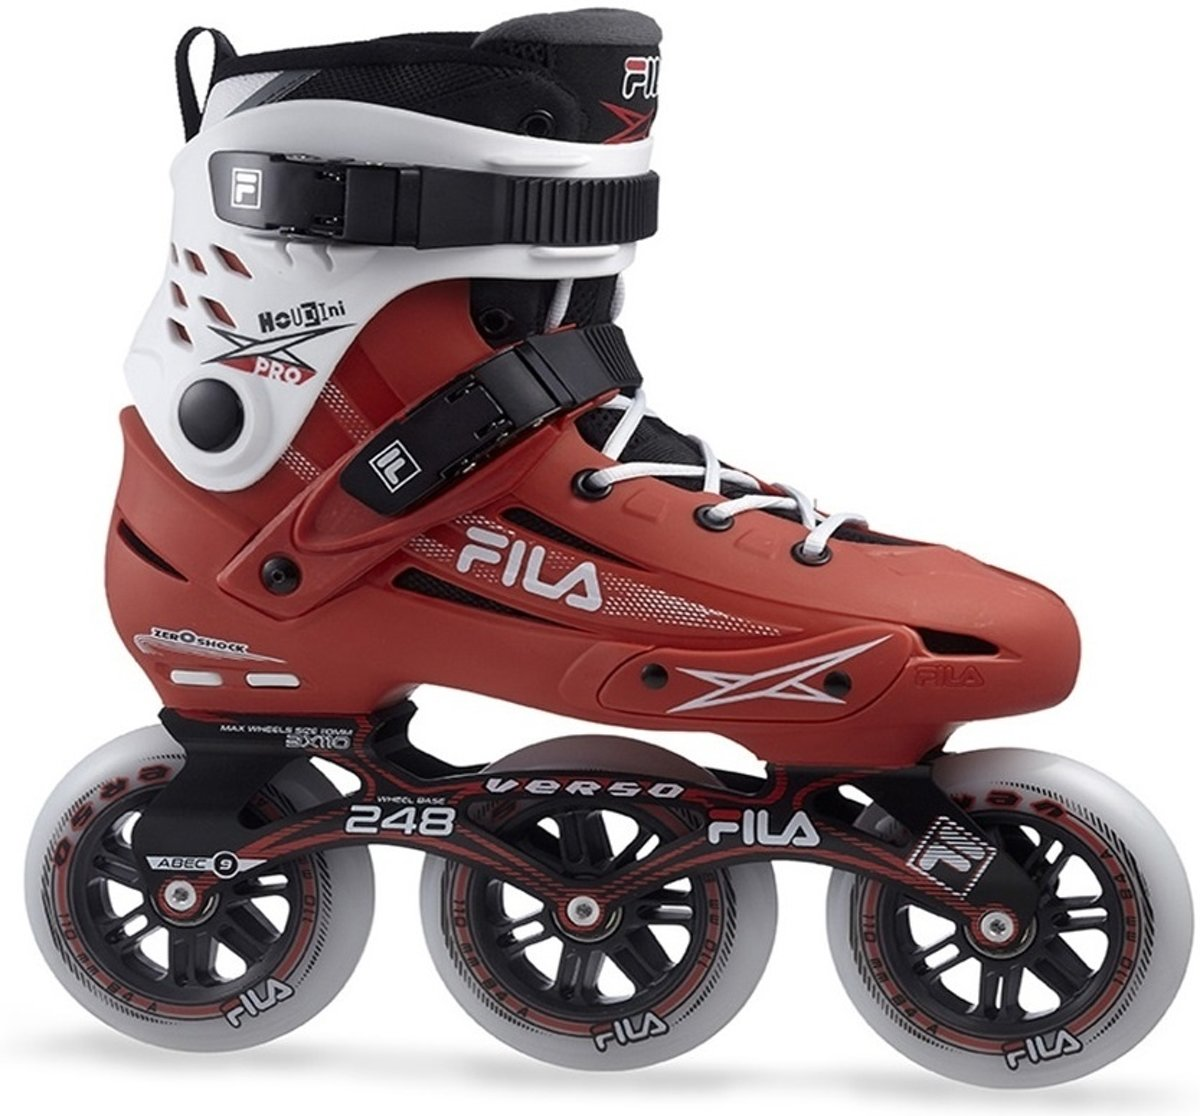 Afbeelding van product FILA INLINE SKATES, HOUDINI PRO 110  - maat 47